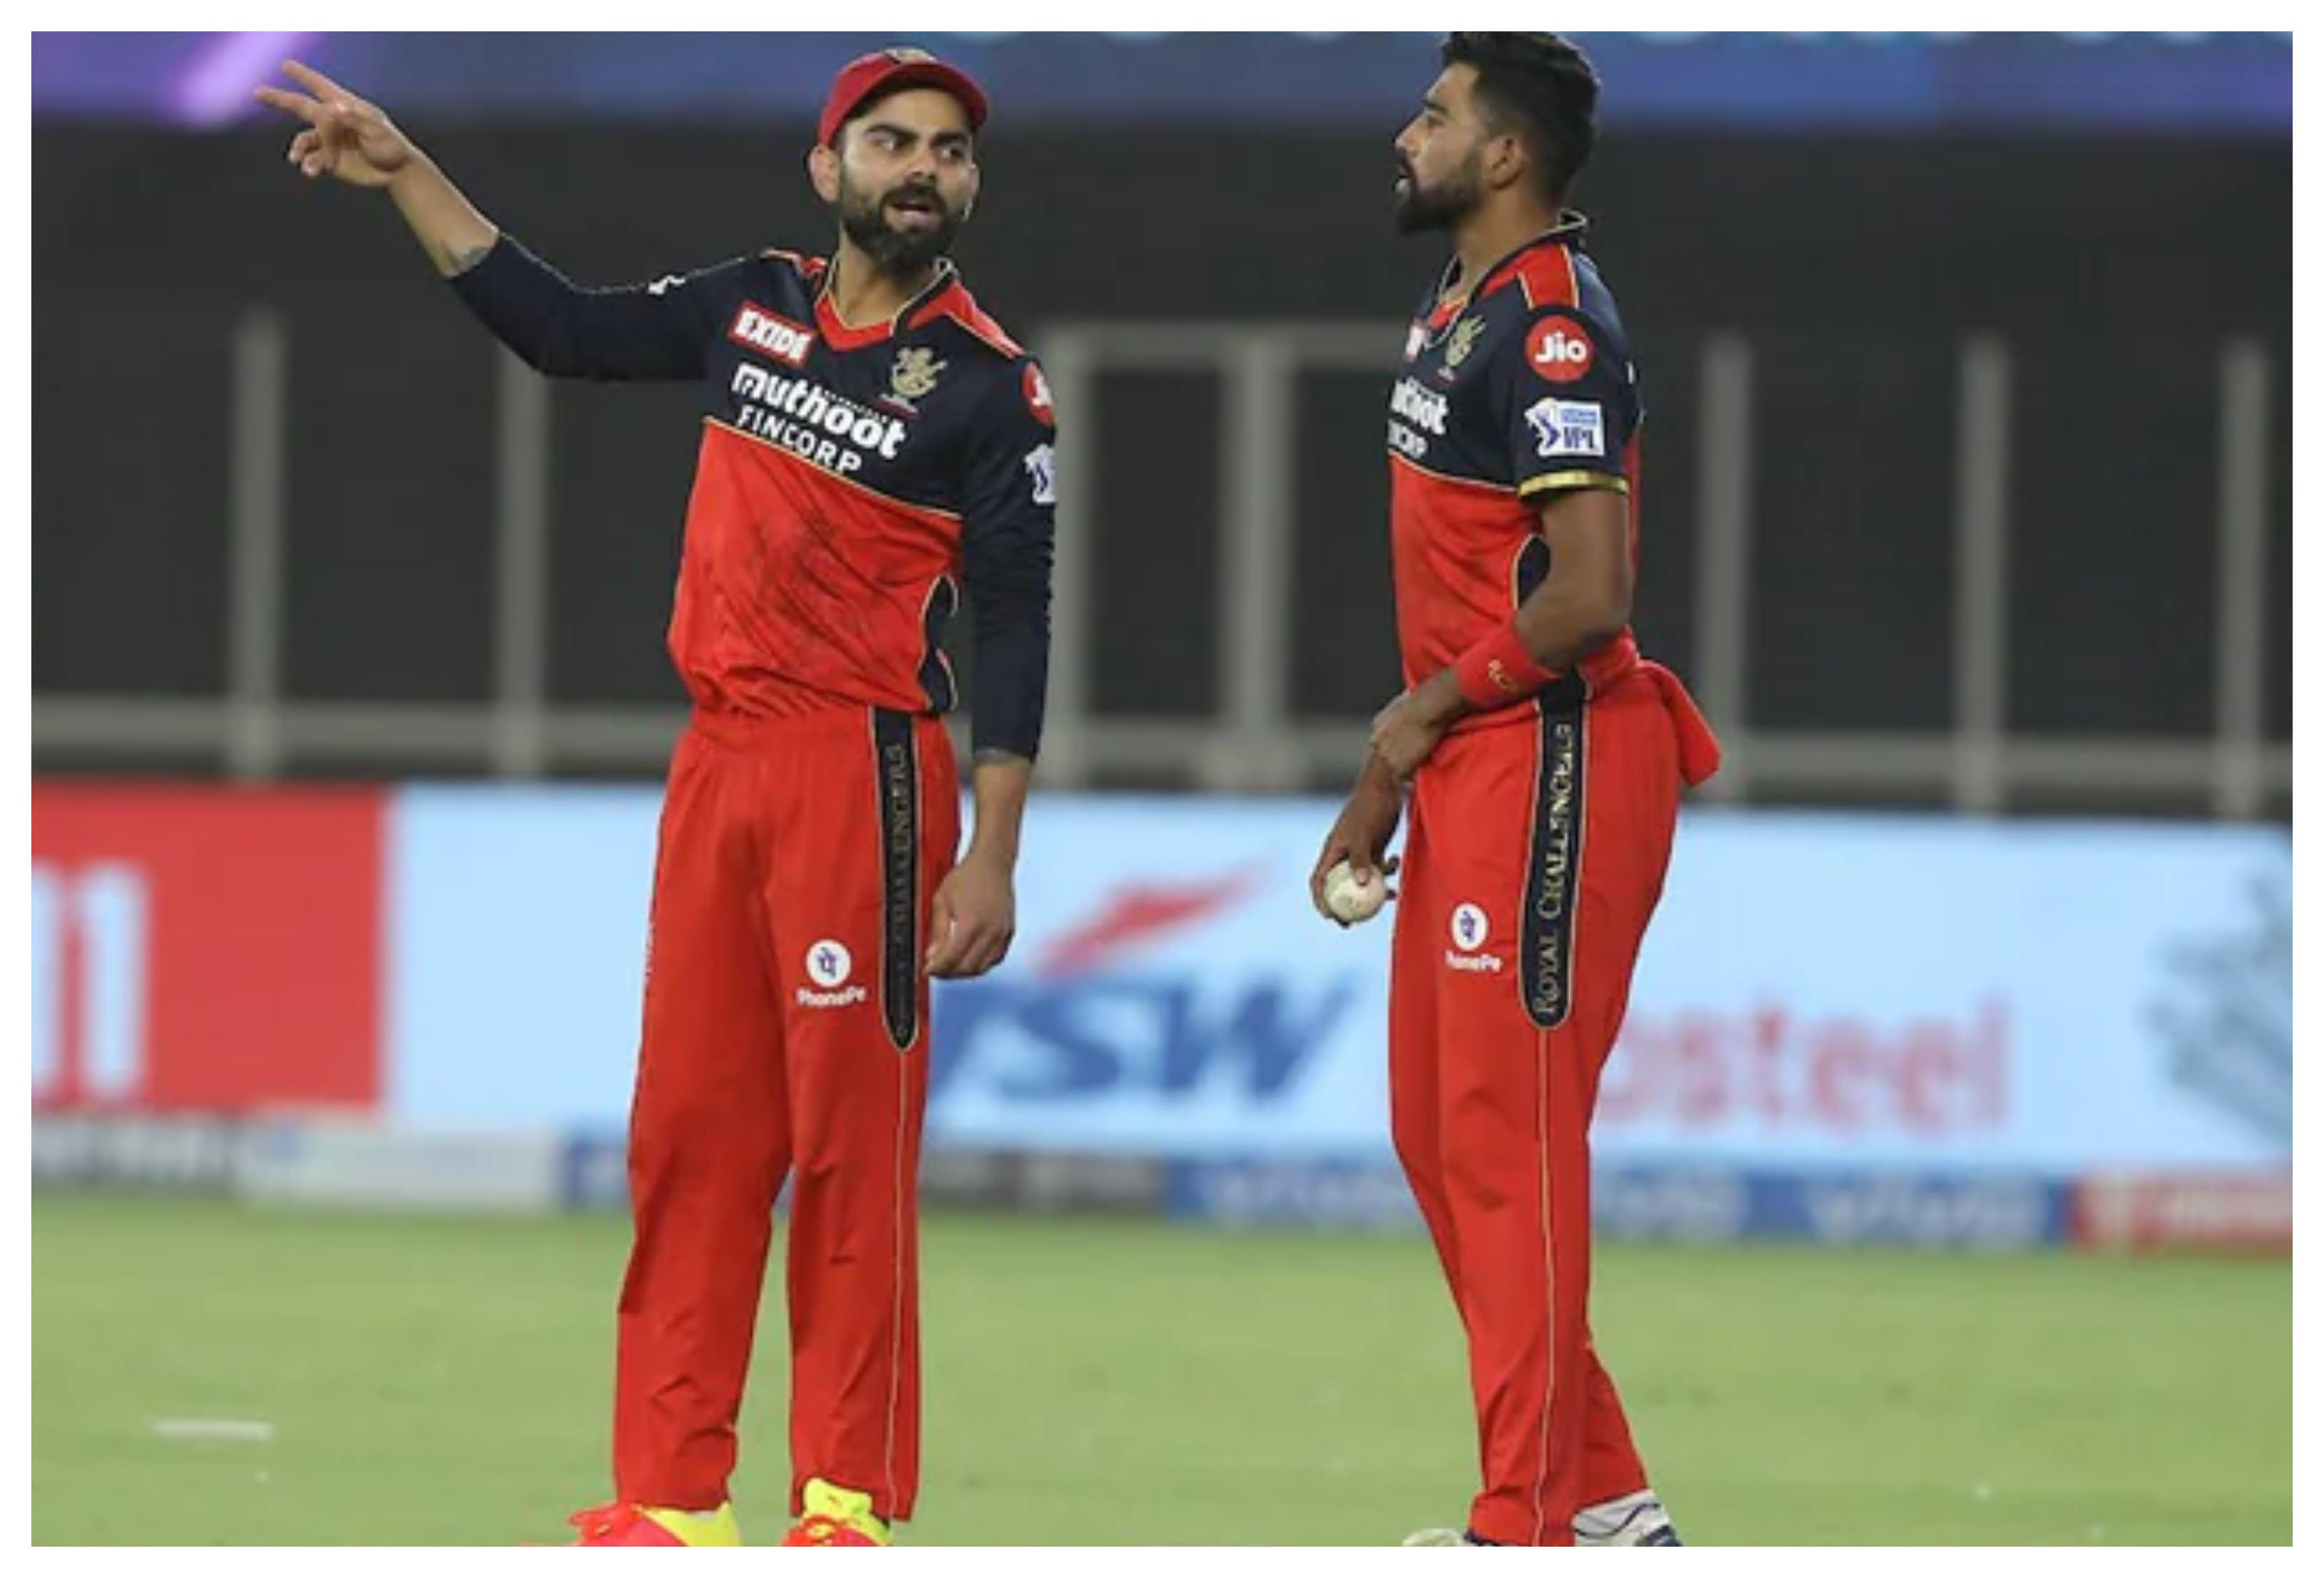 Kohli and Siraj to board charter flight from Manchester to Dubai | BCCI/IPL